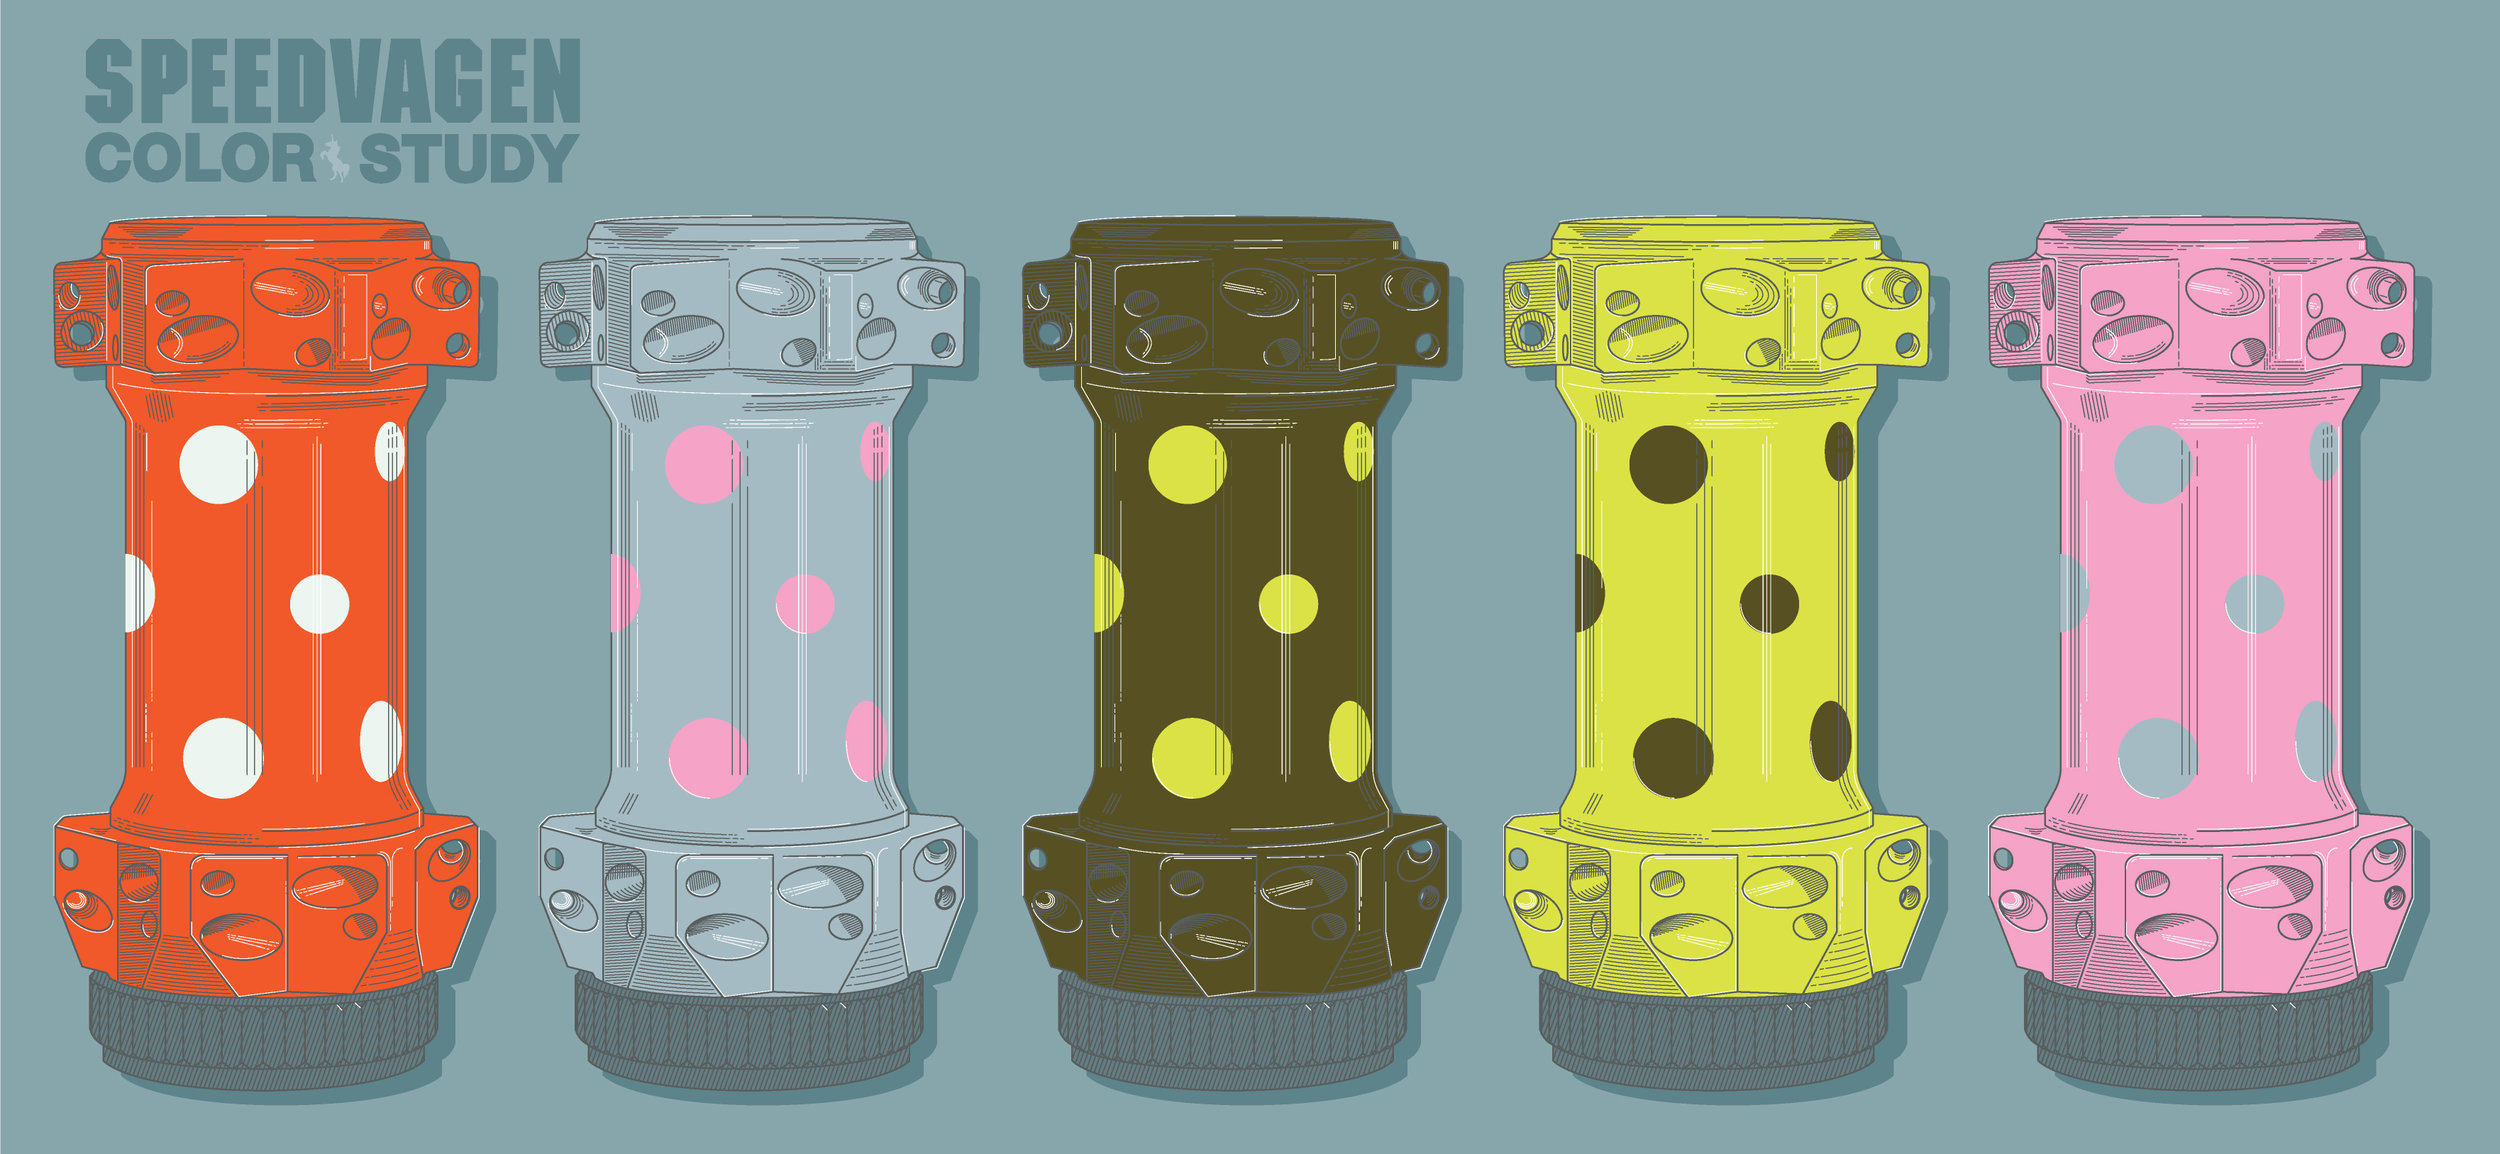 Speedvagen 2017 Colors: Vermillion, Slate, Army, Citron, Pink